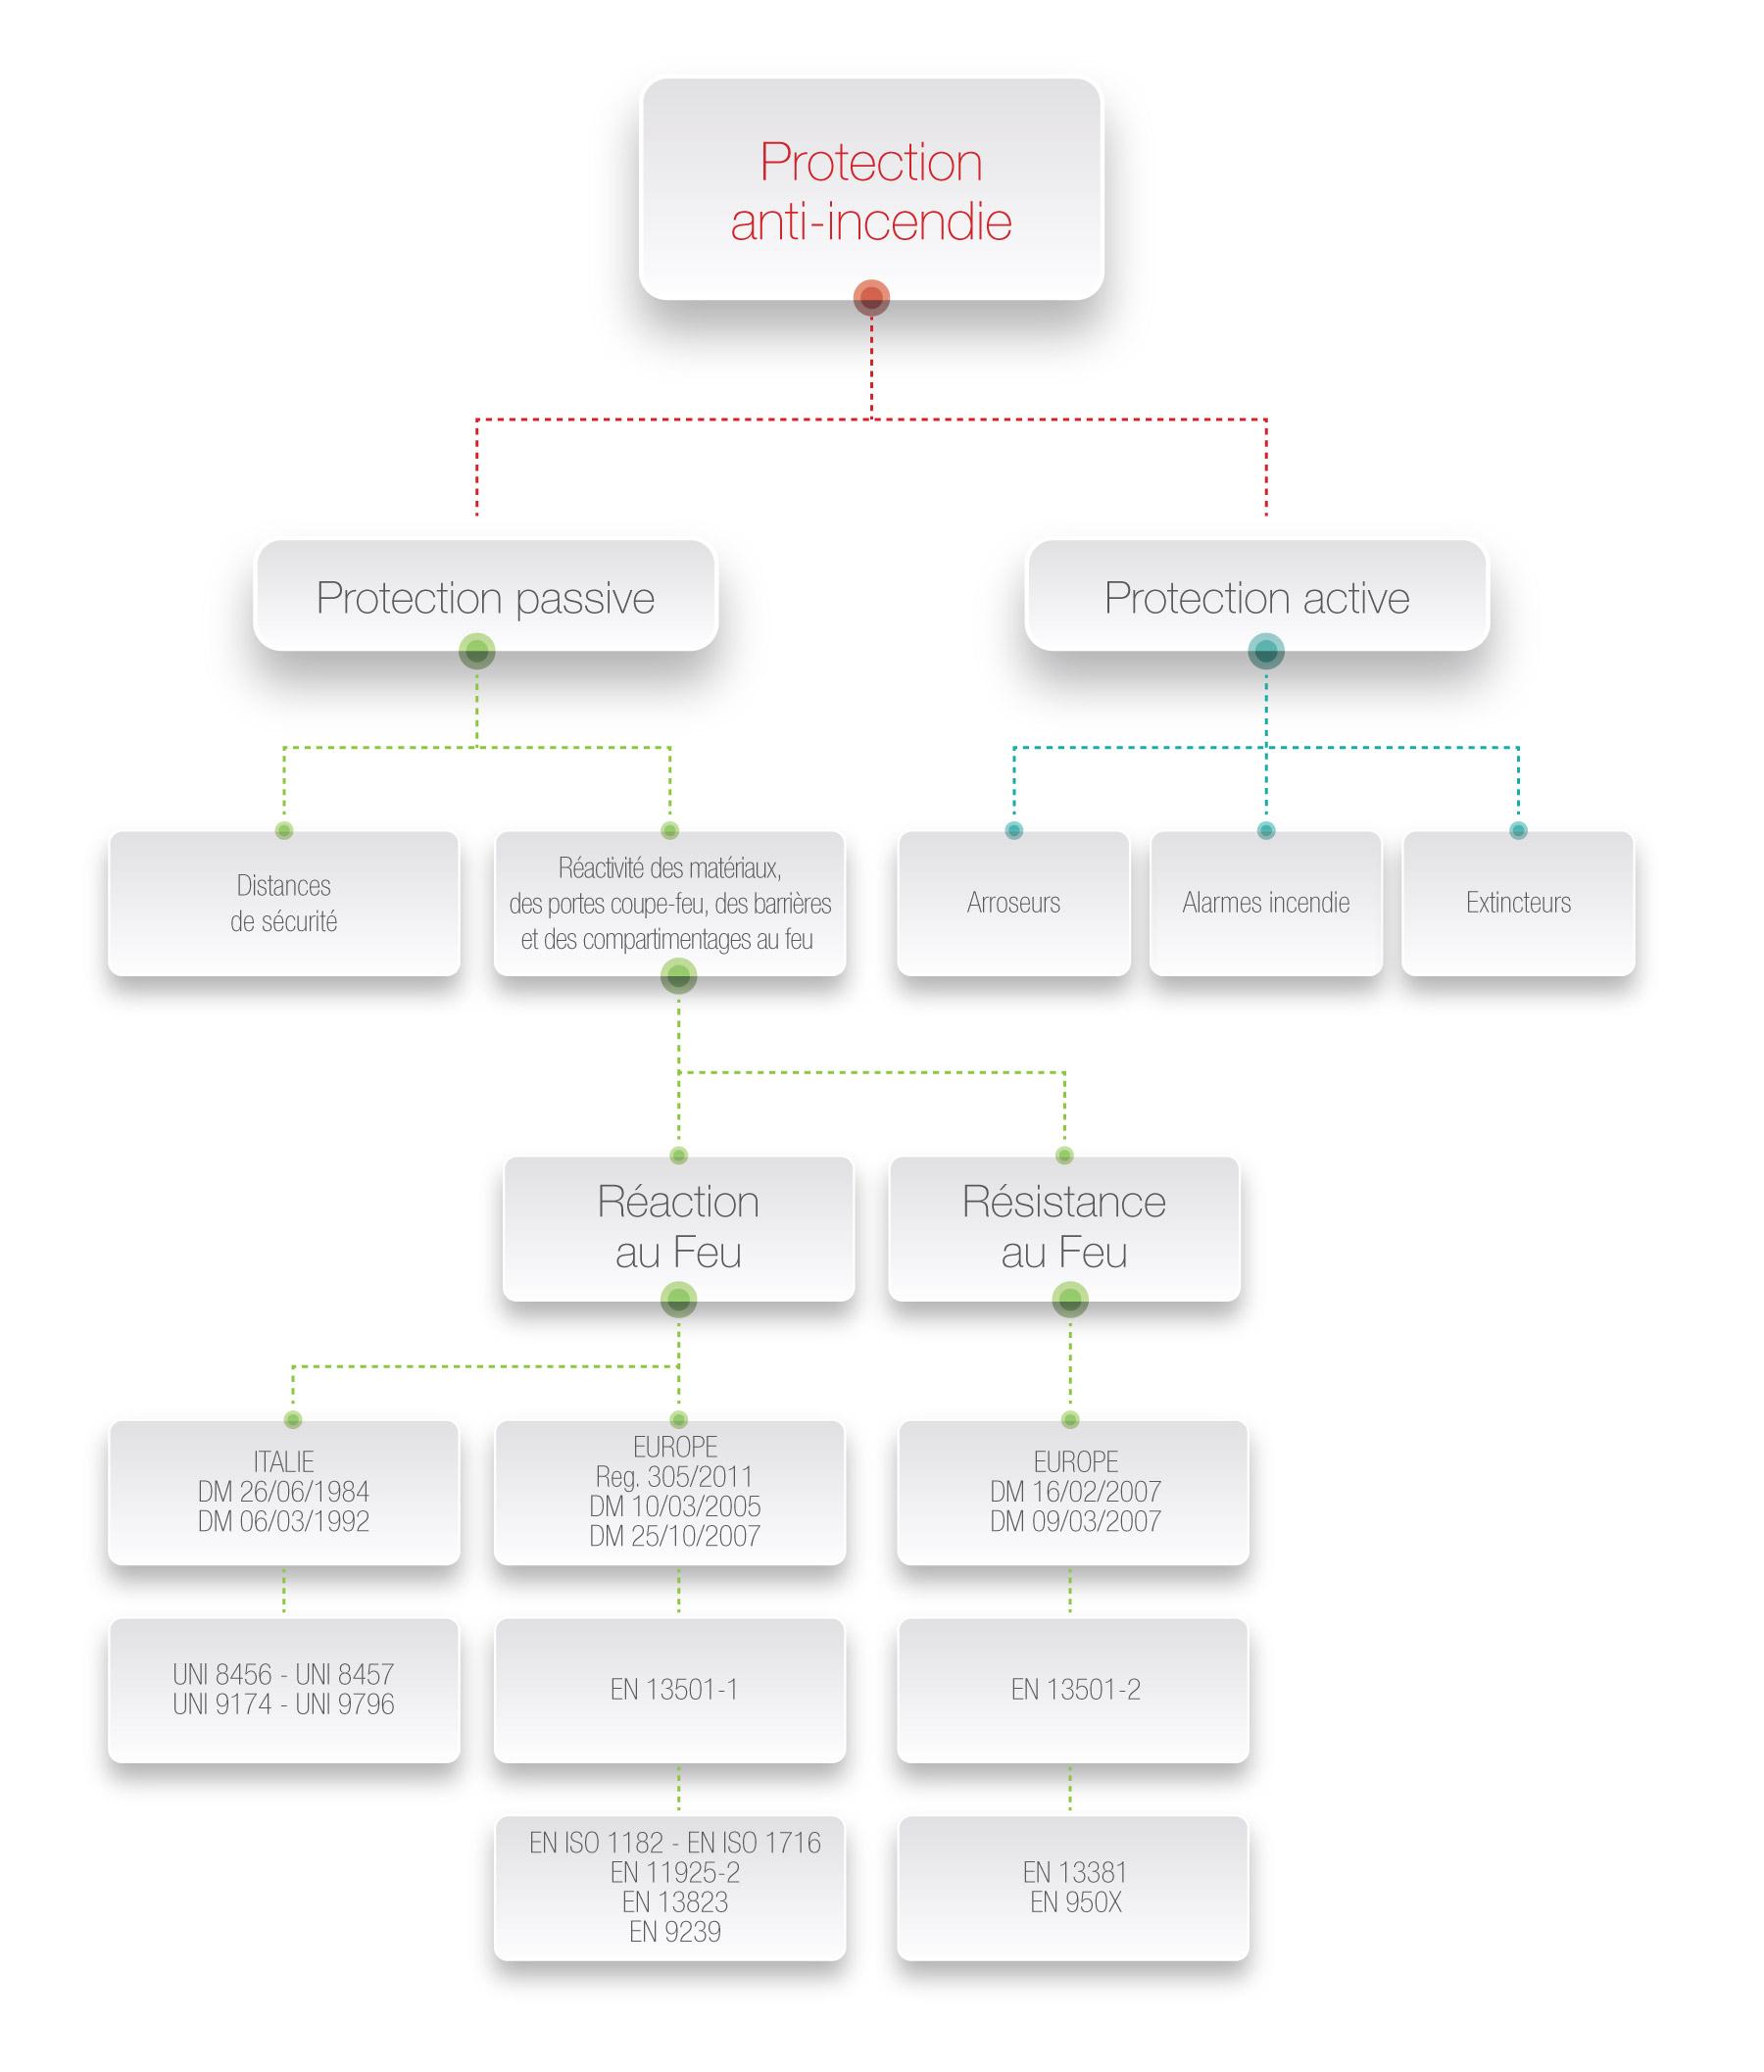 quadro_normativo_web_fr